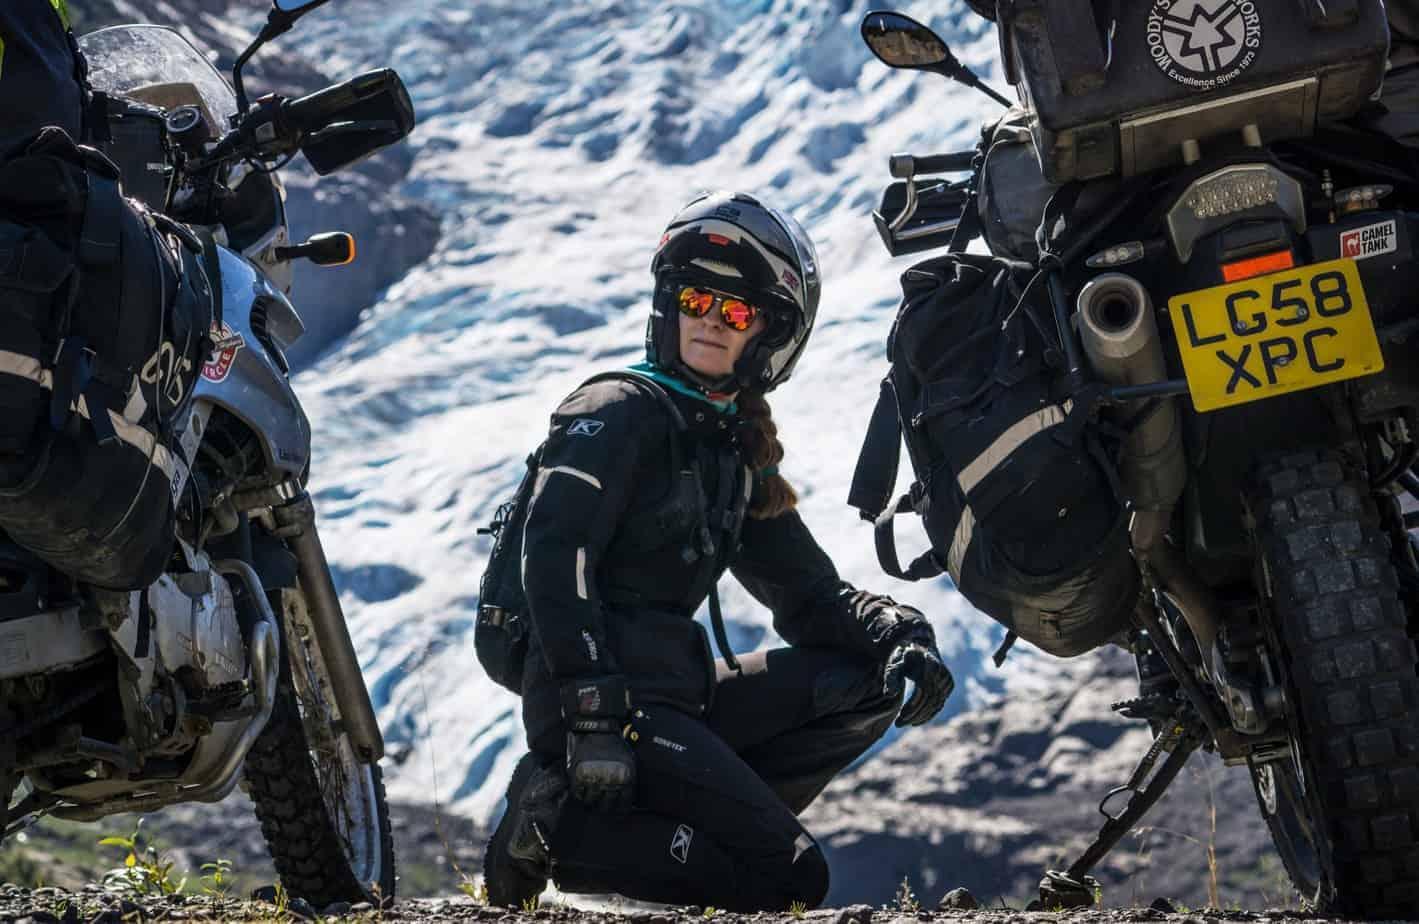 Field Tested: KLIM Women's Altitude Riding Suit